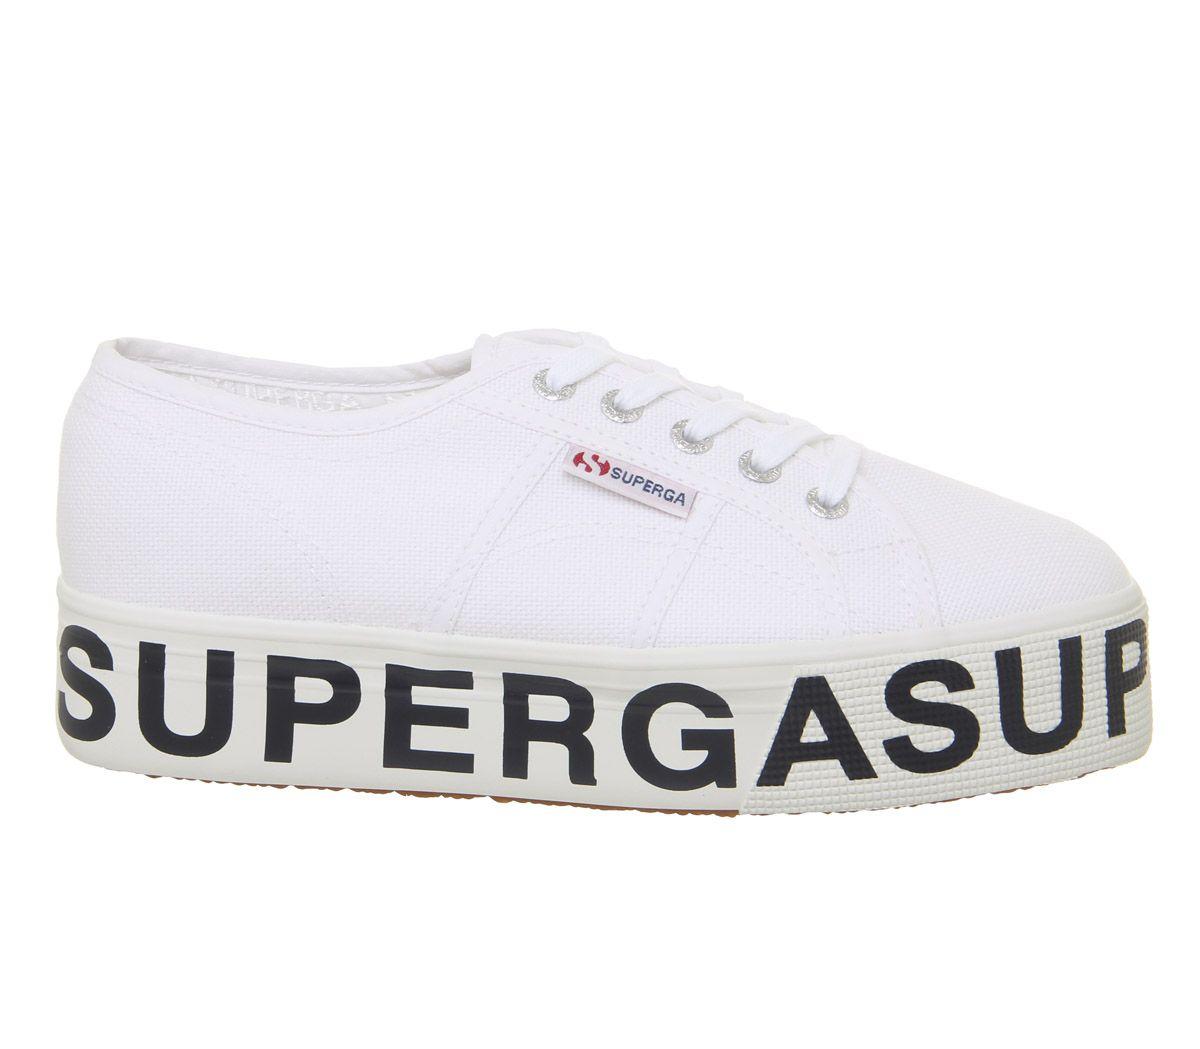 Damen Superga 2790 Turnschuhe Weiß Superga Logo Turnschuhe